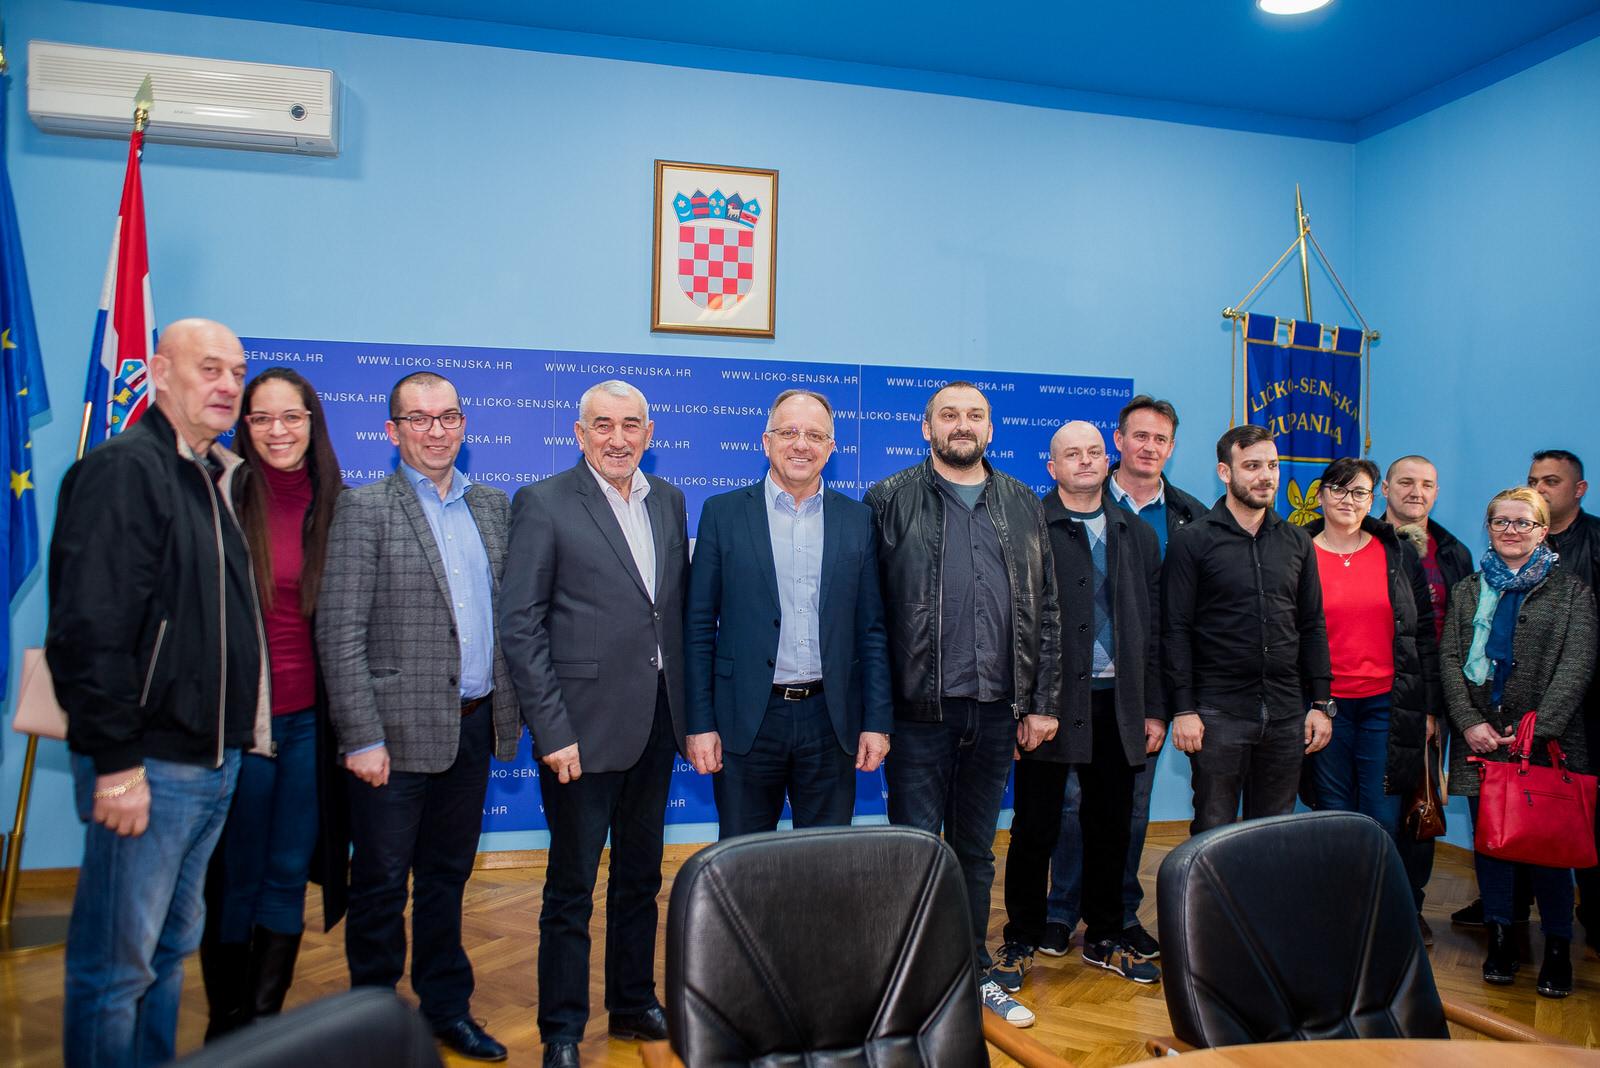 likaclub_politika-gospić_2019_bura-promjena-15